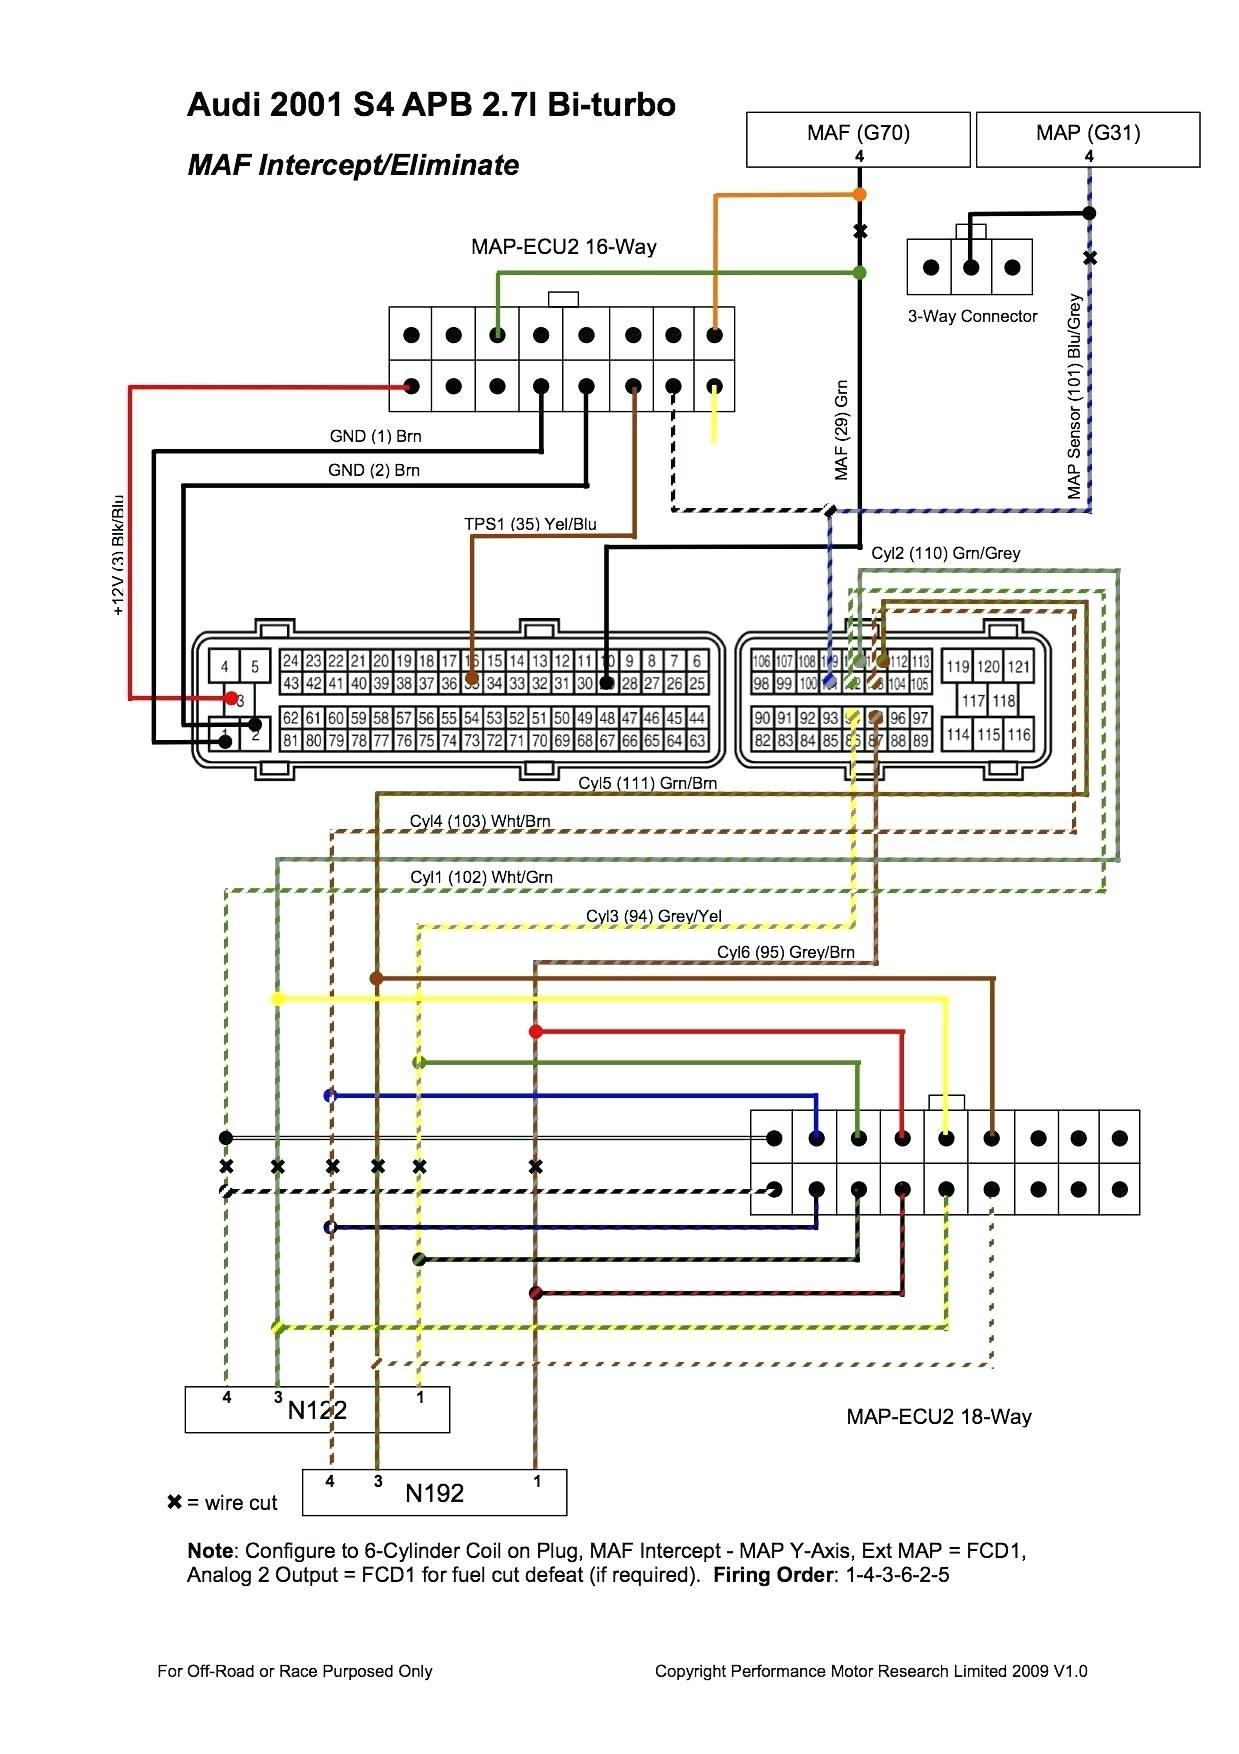 2004 dodge durango infinity sound system wiring diagram 4 plug trailer 1991 honda accord my